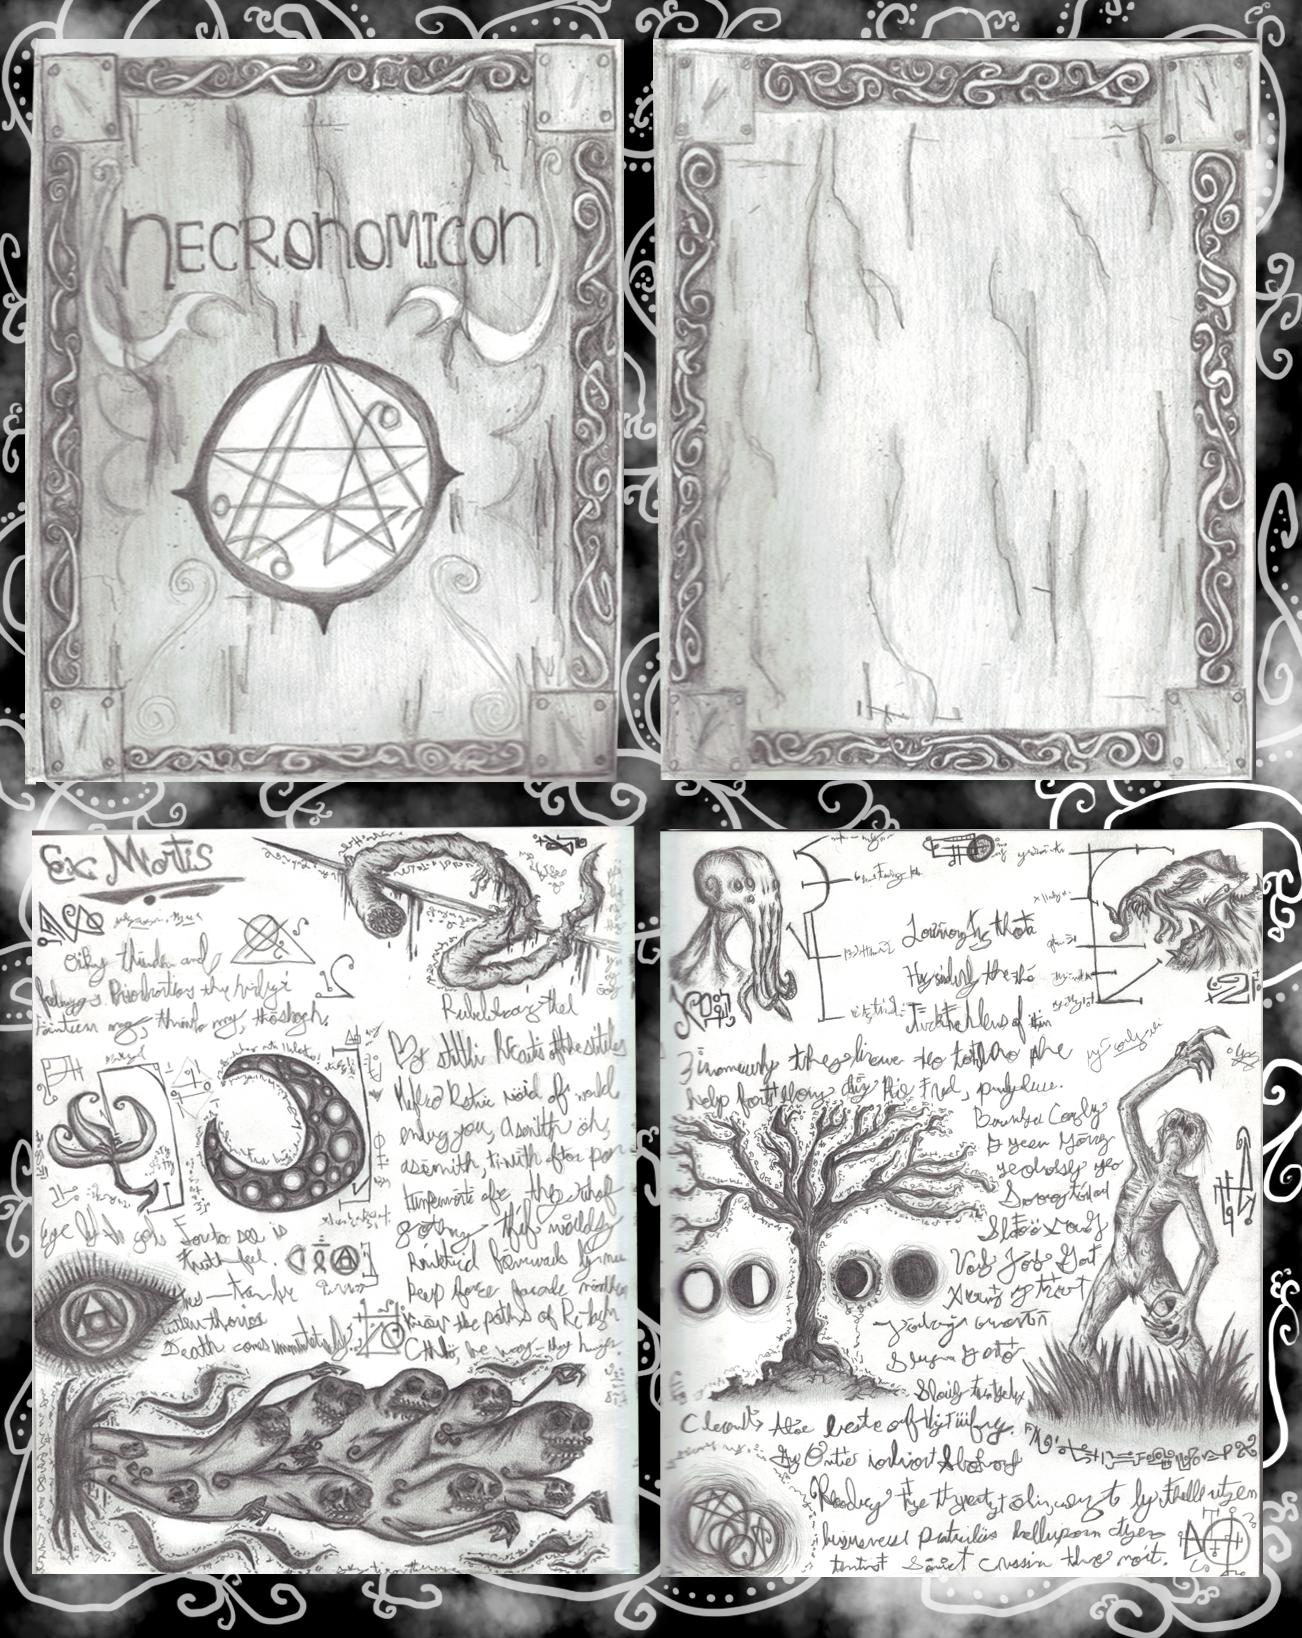 Do the Necronomicon by ChOiCeS